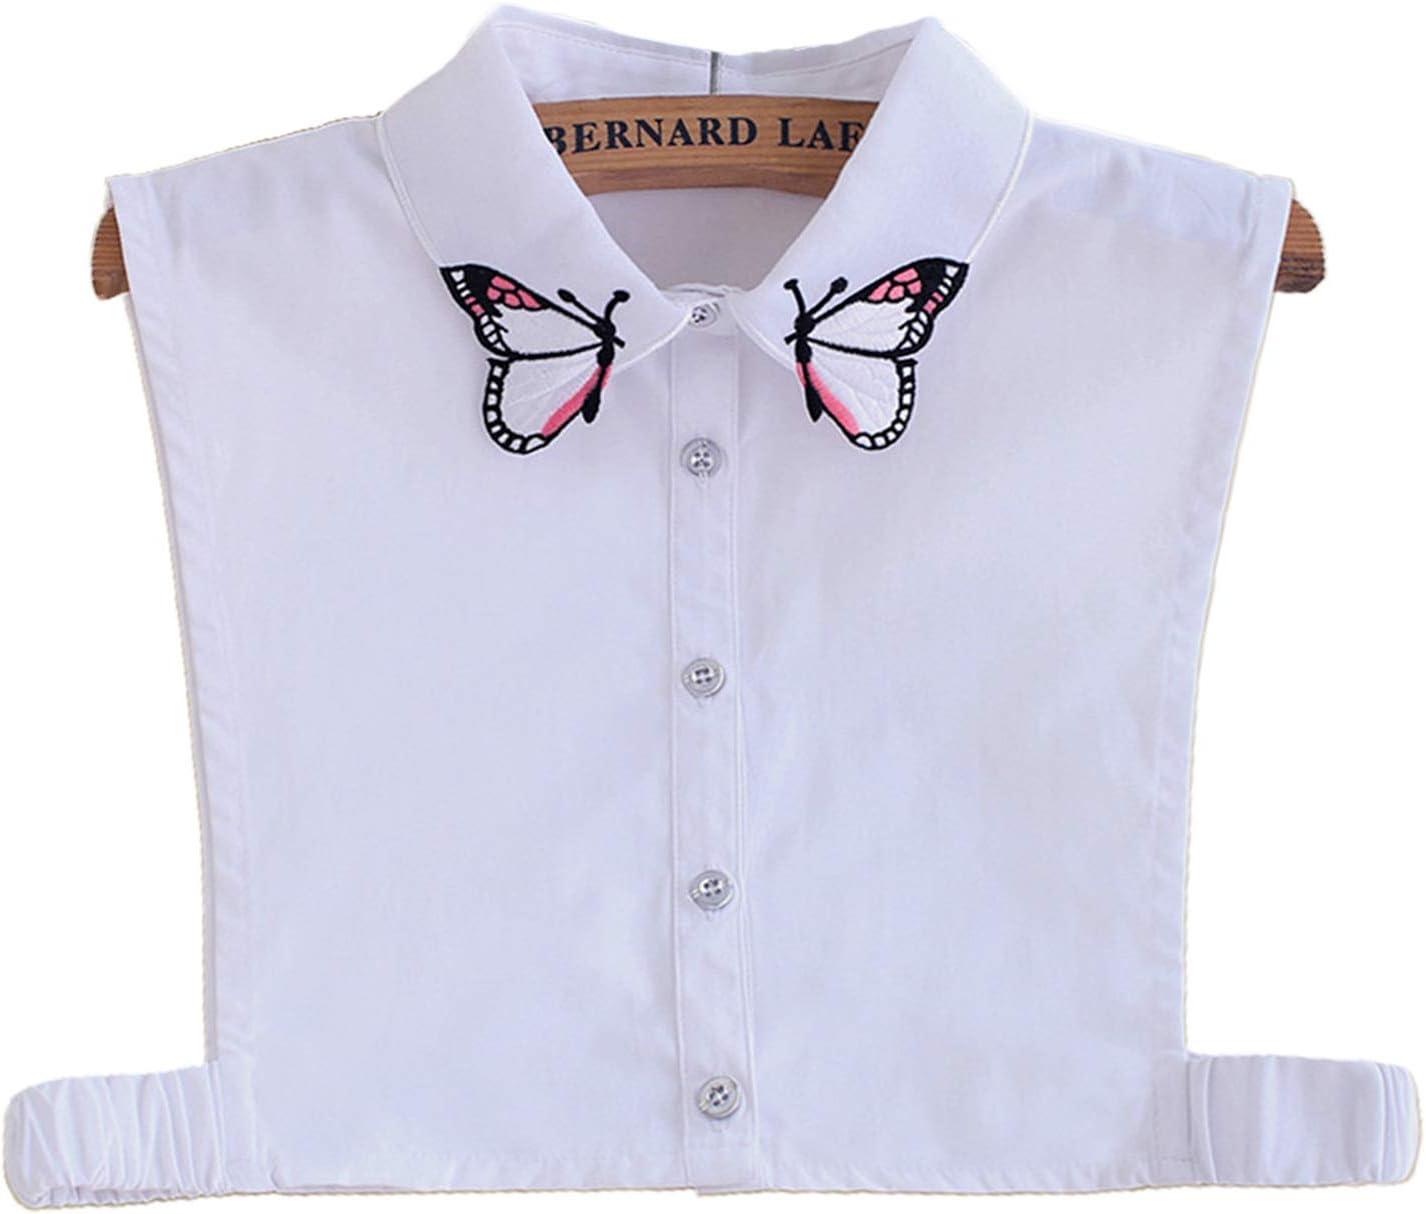 kdjsic Mujeres Elegante Colorido Mariposa Bordado Solapa Cuello Falso botón Desmontable Media Camisa Blusa Dickey